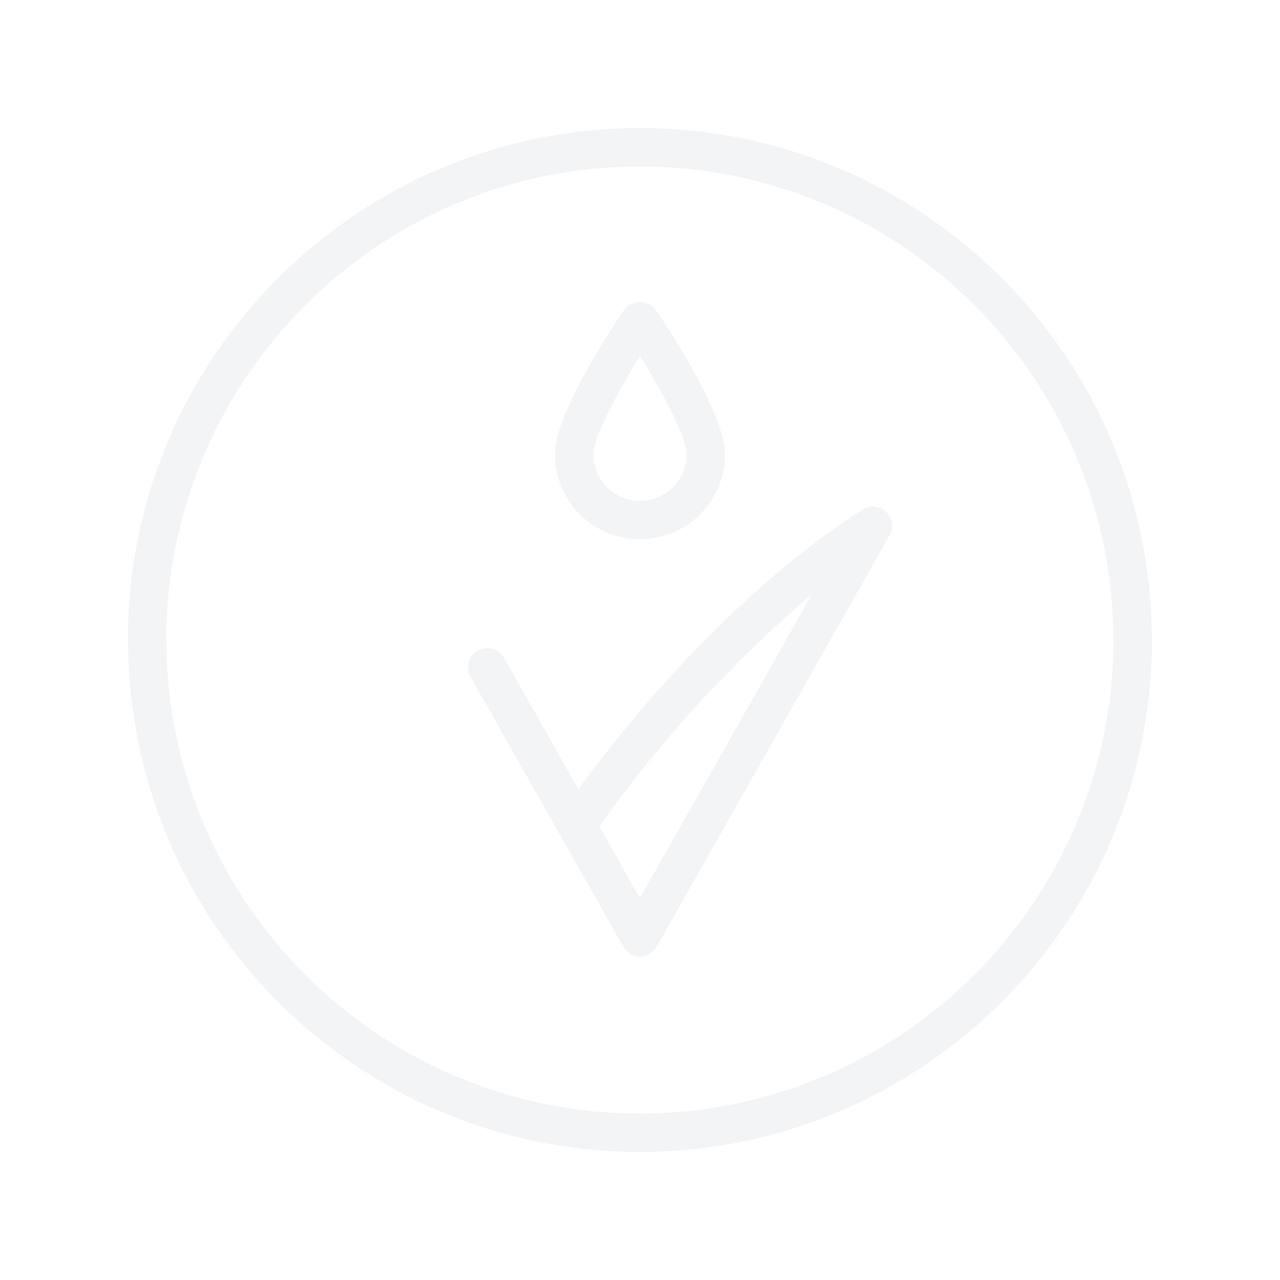 THE VINTAGE COSMETIC Contour Face Brush Gift Set кисти для макияжа контура лица